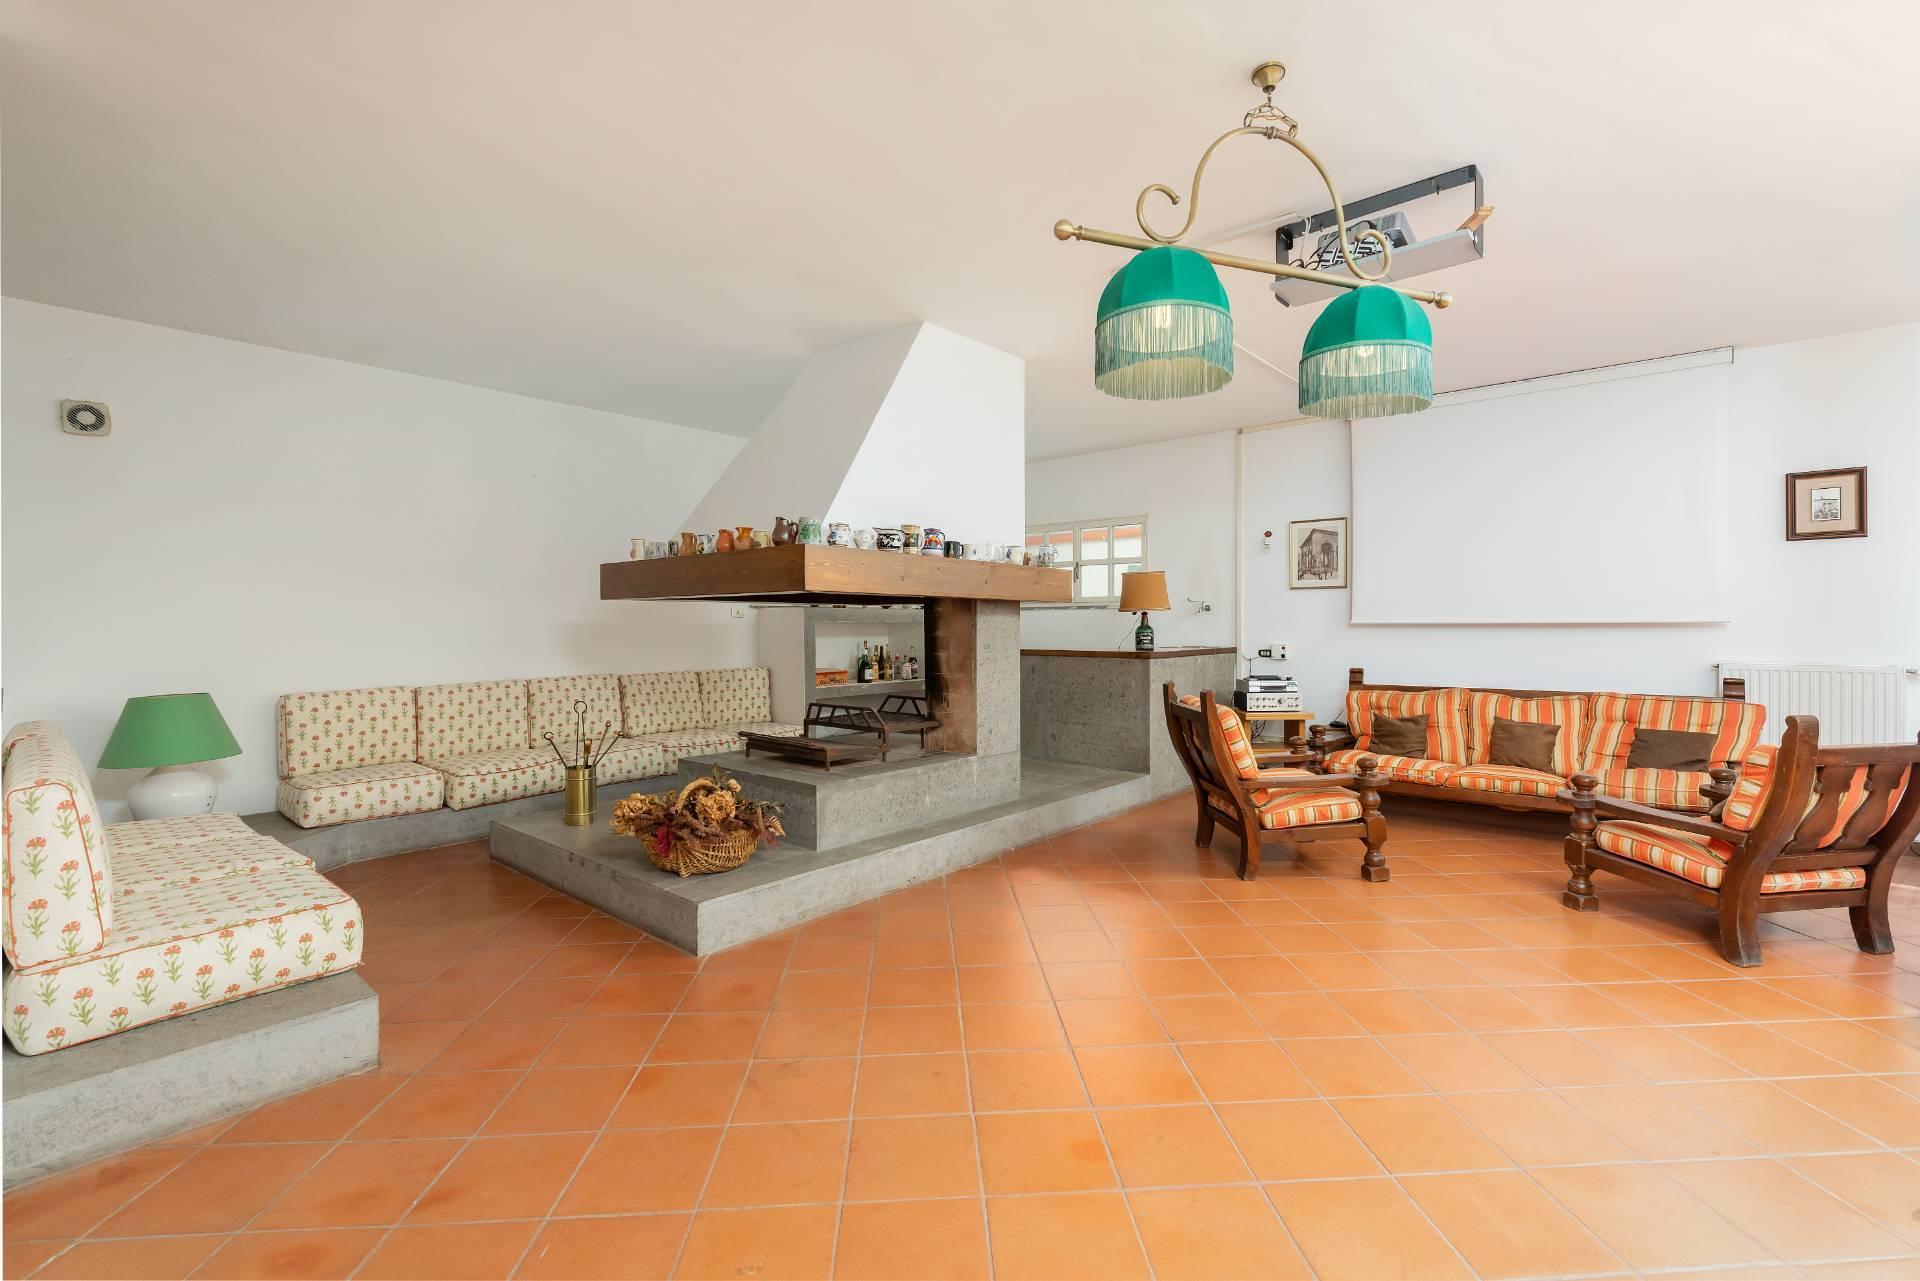 Villa in Vendita a Ariccia: 5 locali, 583 mq - Foto 24